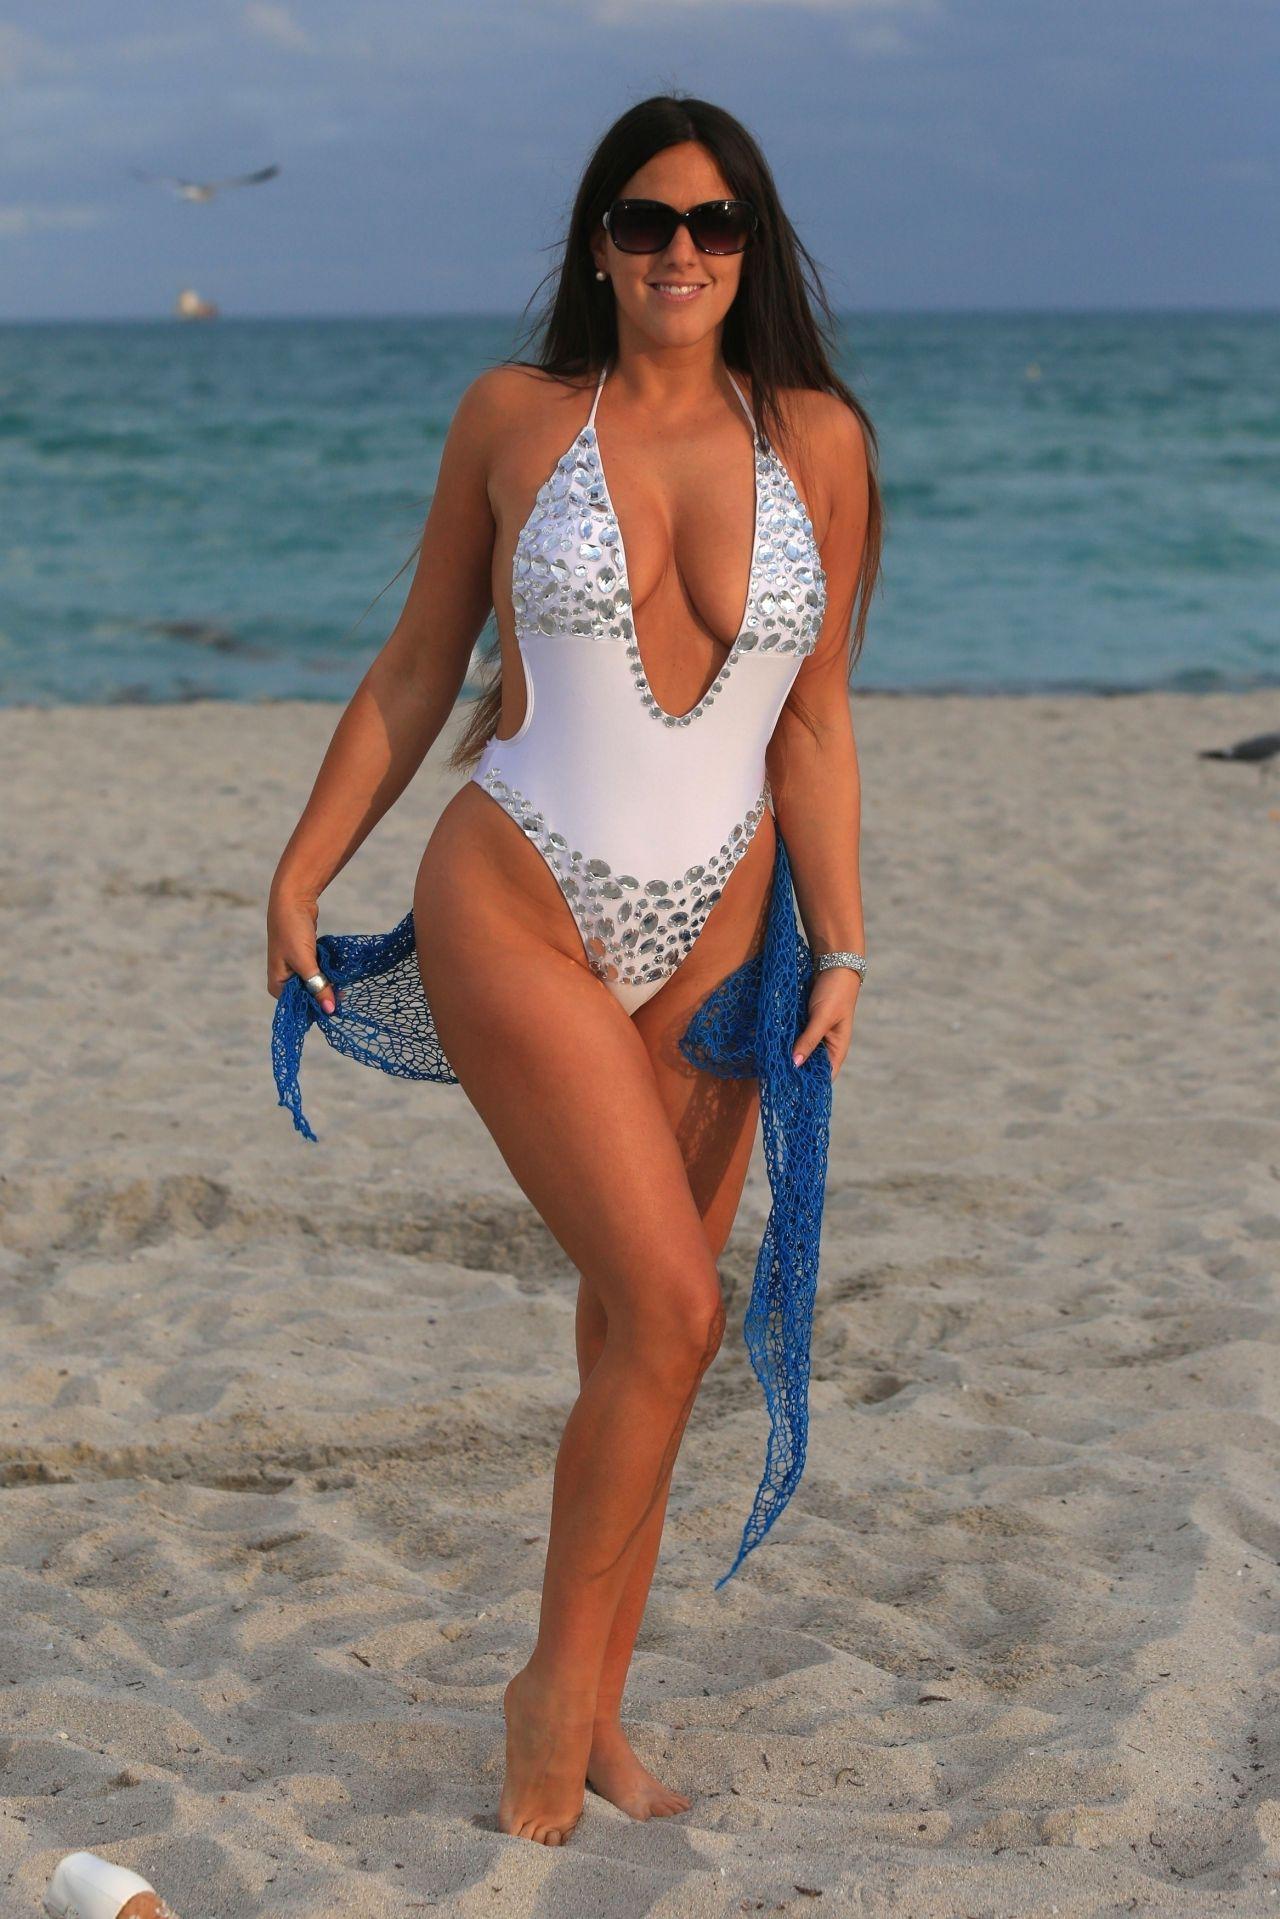 Claudia Romani nudes (98 photos), Pussy, Paparazzi, Boobs, legs 2006